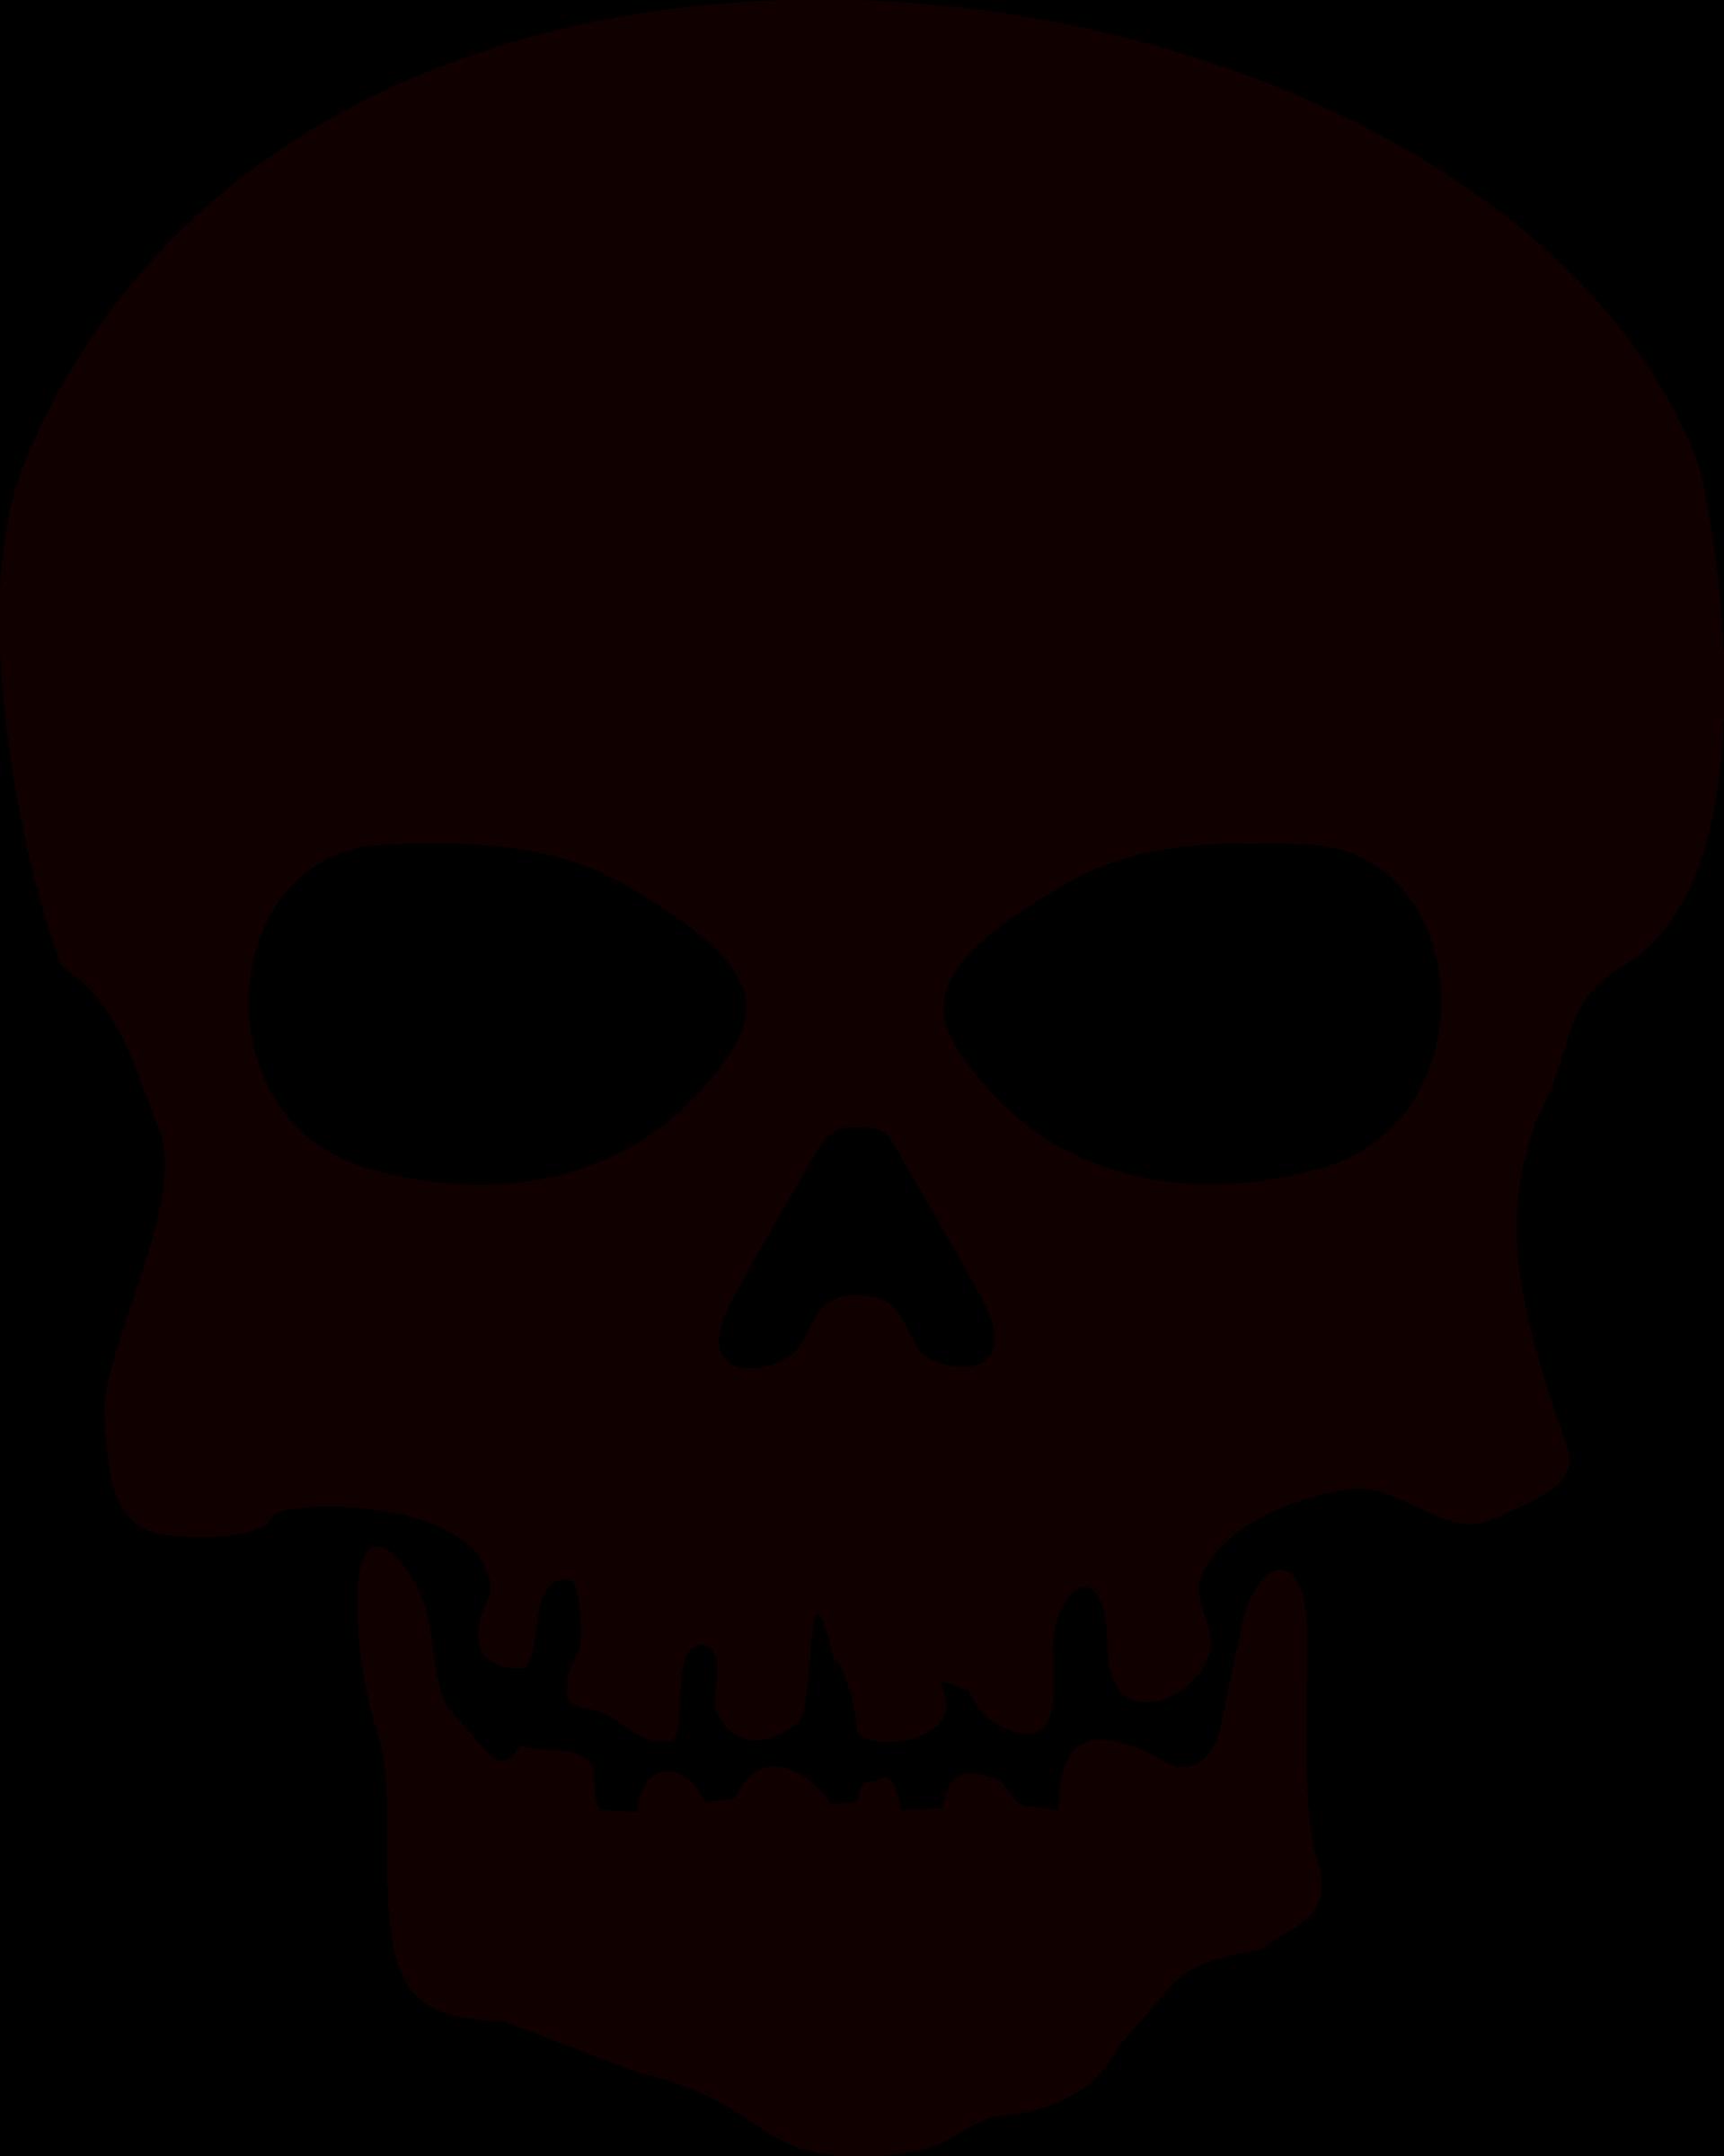 Download Skeleton Head Png Images Transparent Gallery. Advertisement - Skeleton Head, Transparent background PNG HD thumbnail